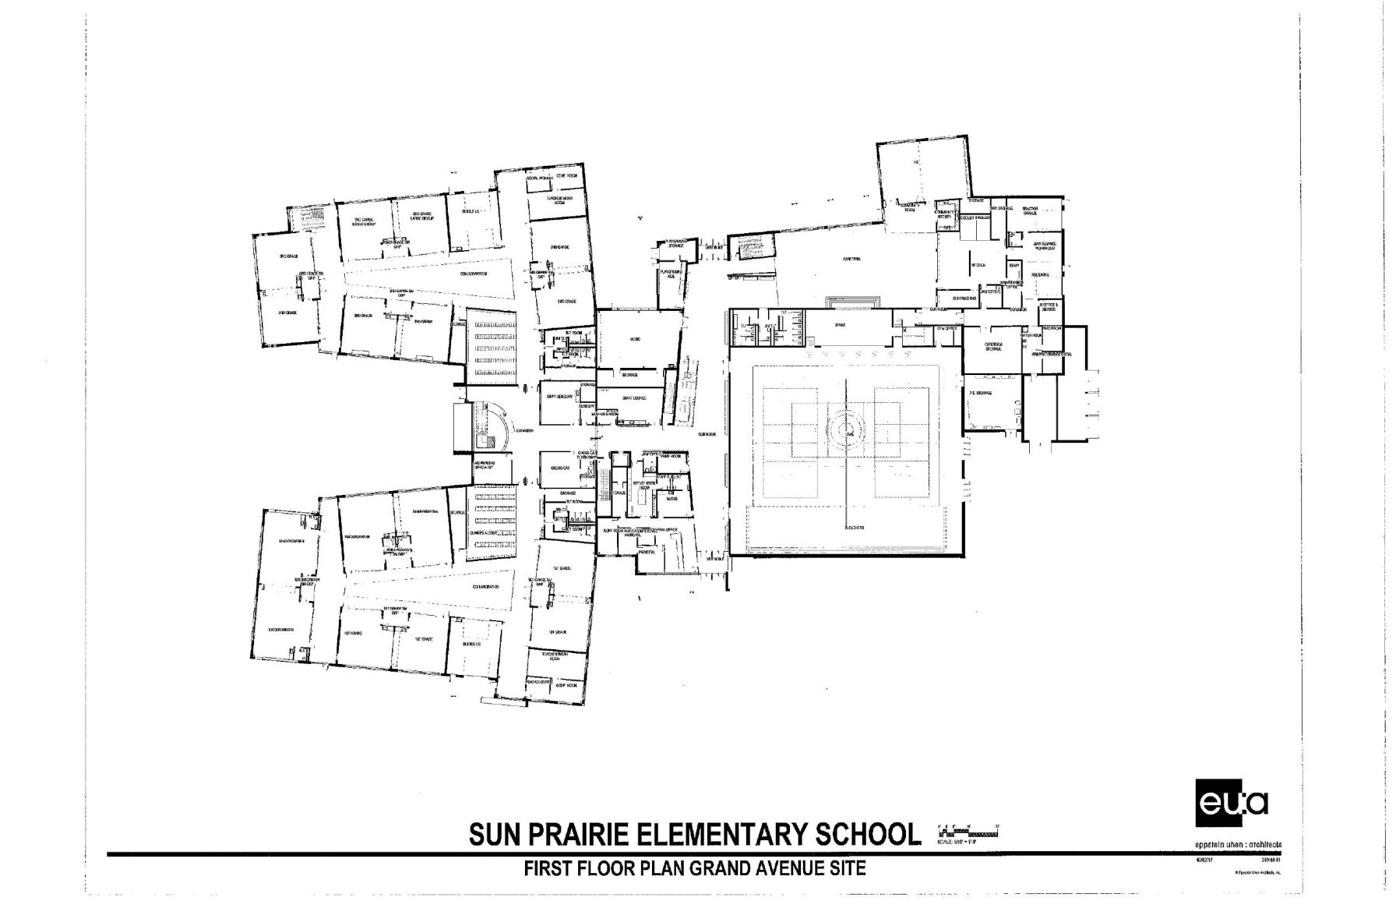 grand avenue preliminary floor plan 2-6-17.pdf